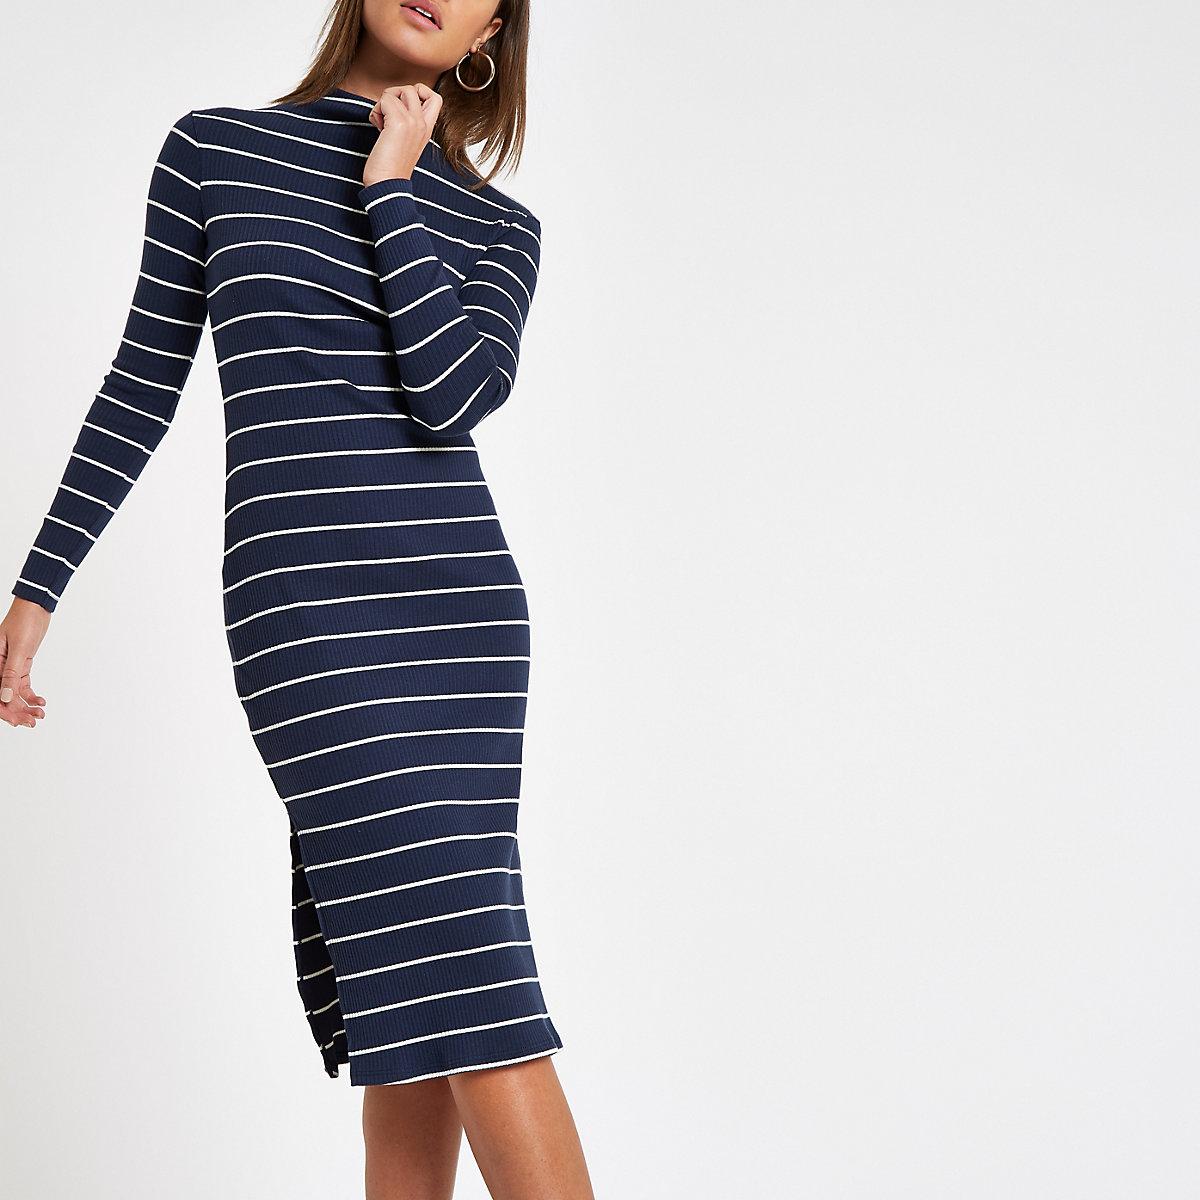 Navy stripe high neck bodycon dress